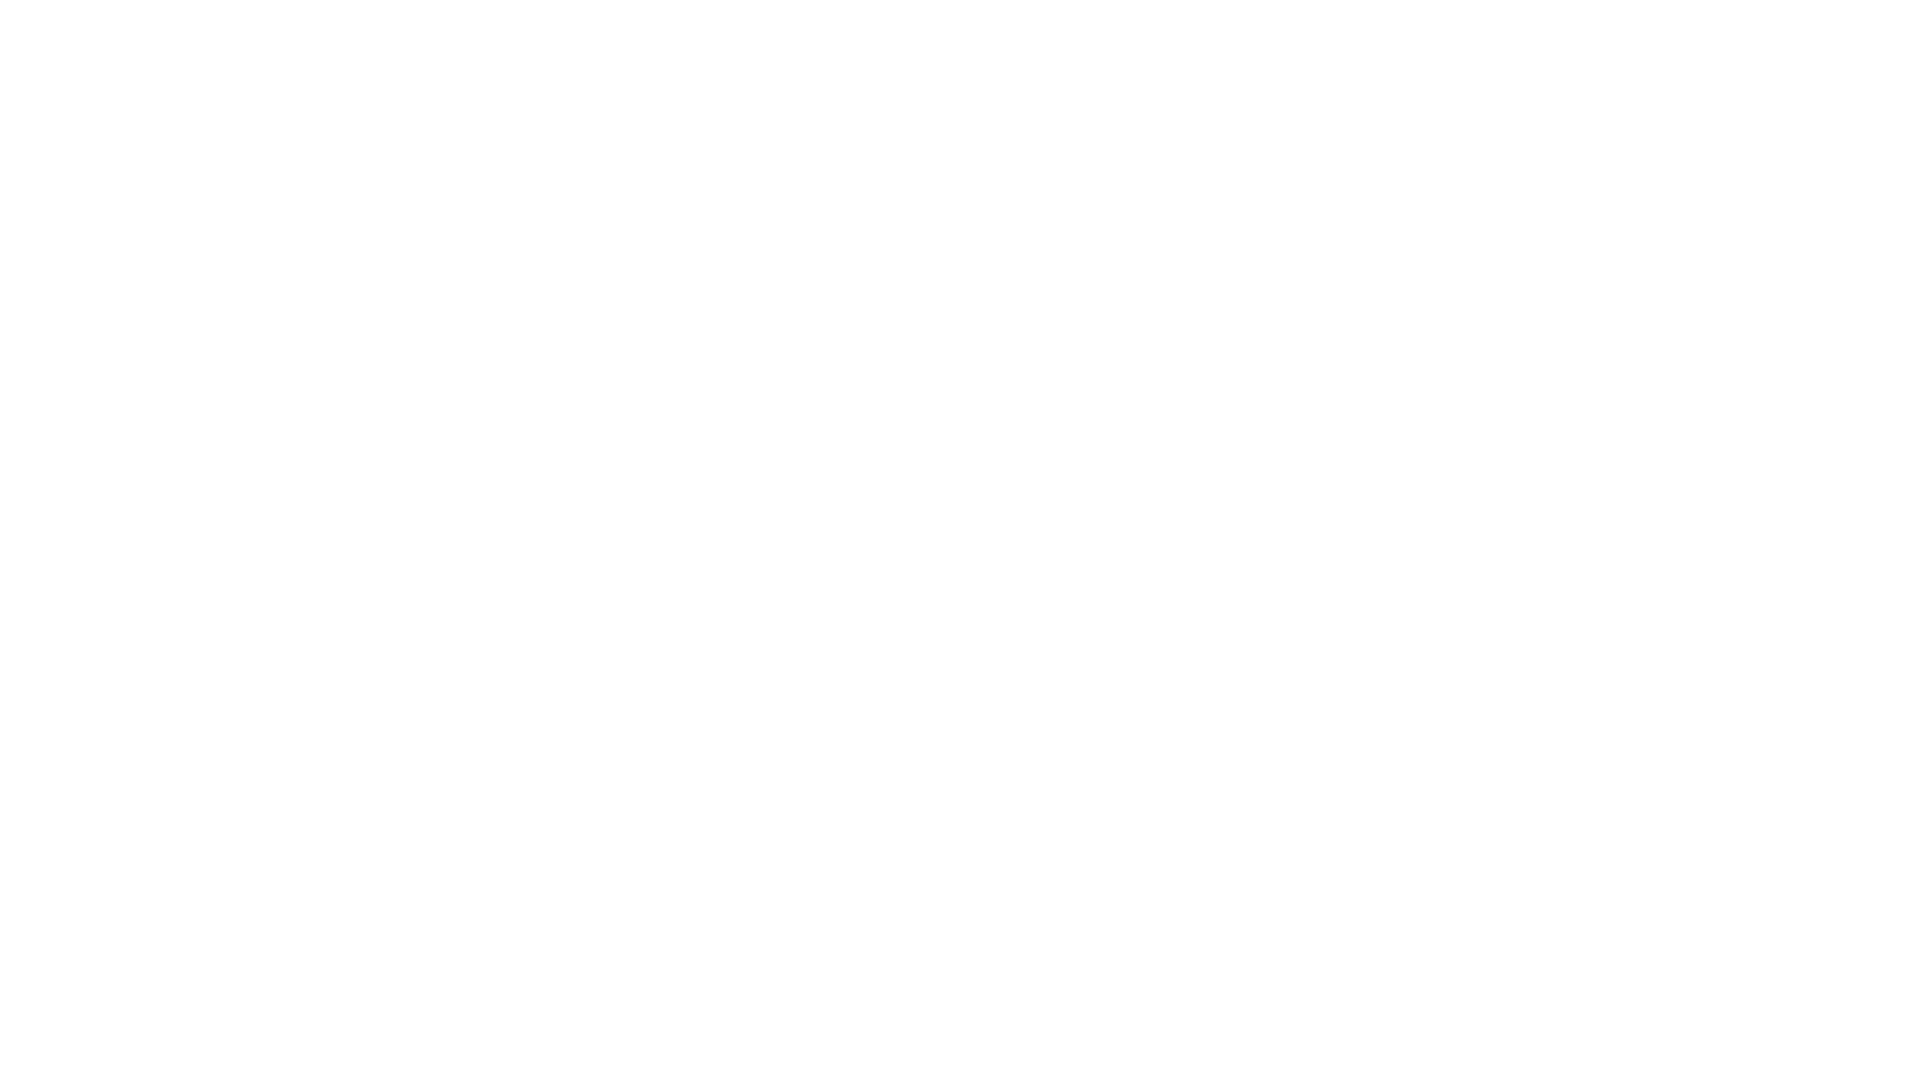 connectgrupp